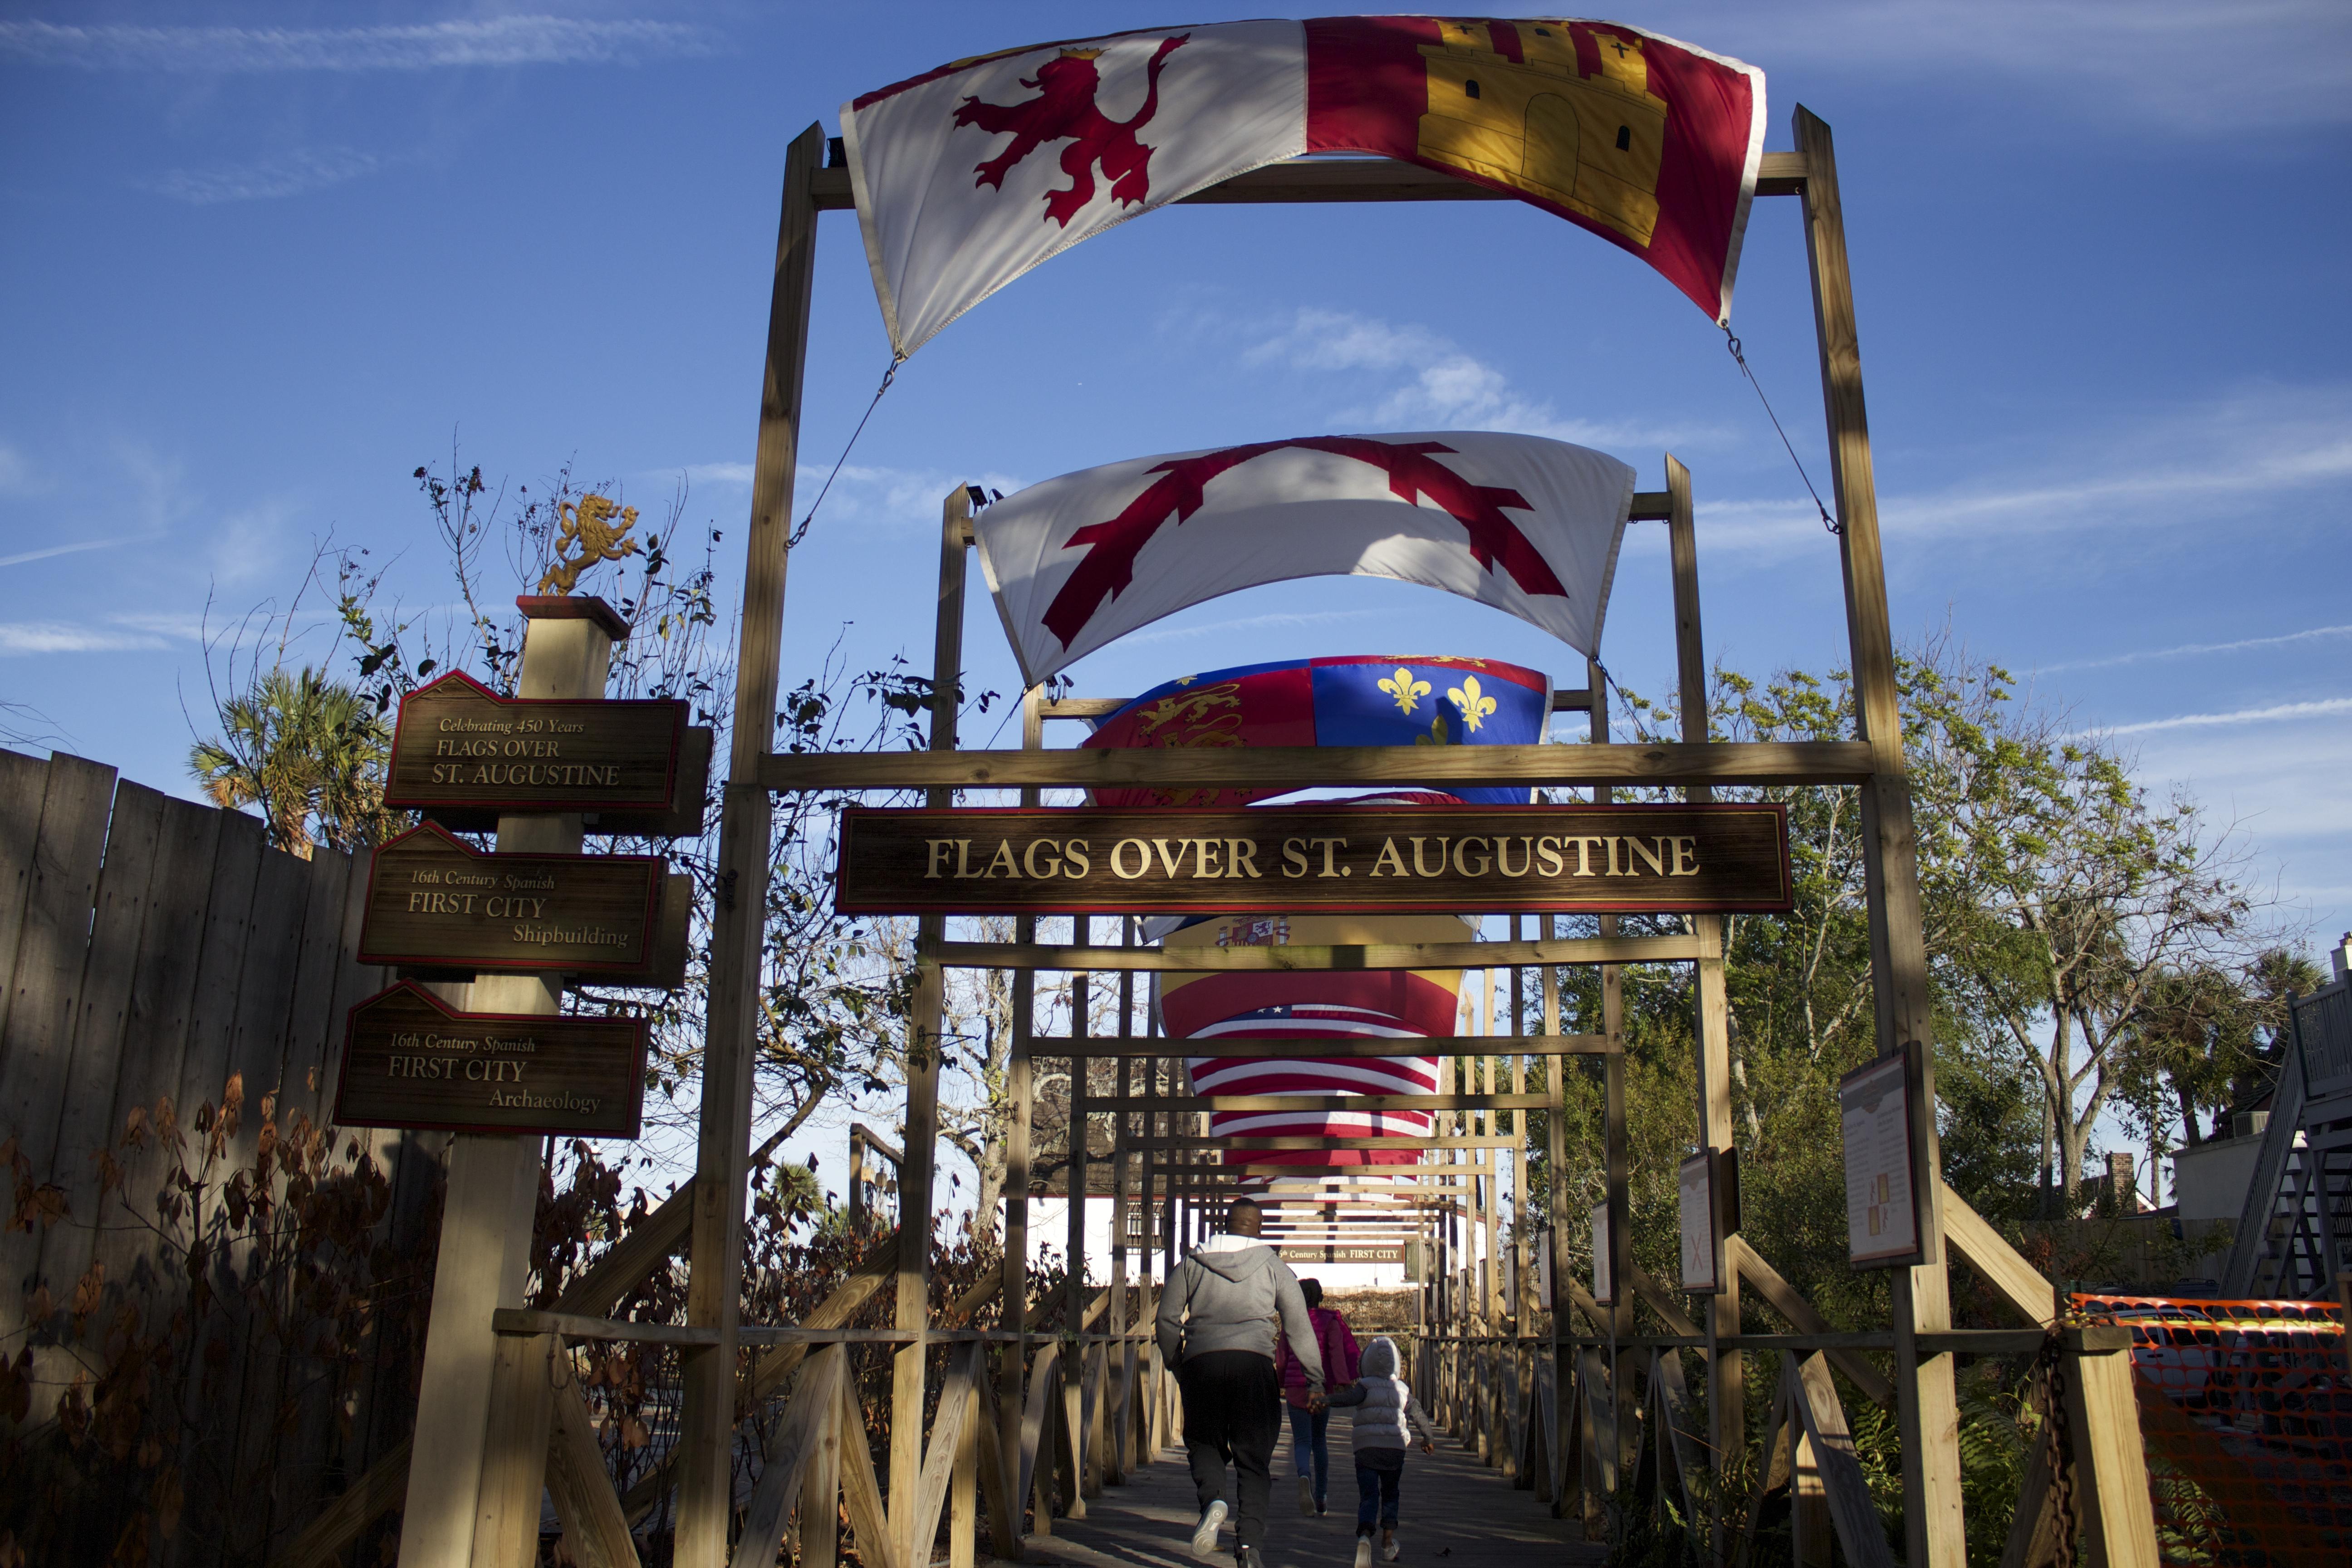 flags colonial quarter st augustine